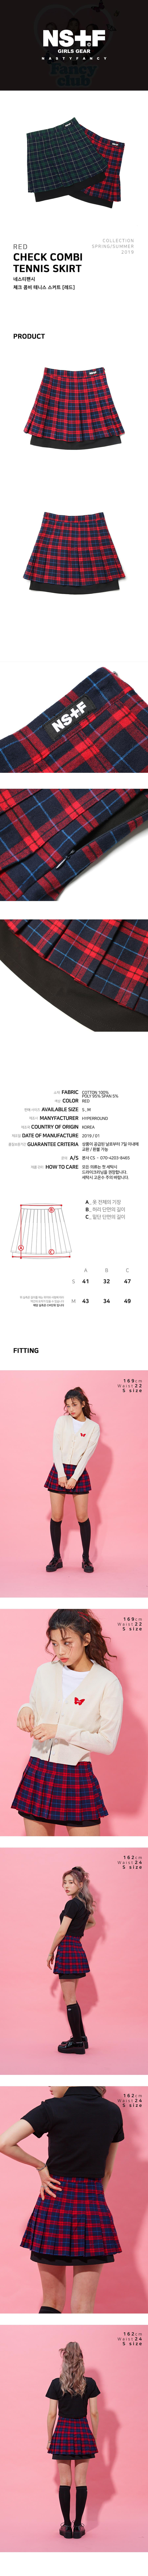 [NF] CHECK COMBI TENNIS SKIRT (RED).jpg